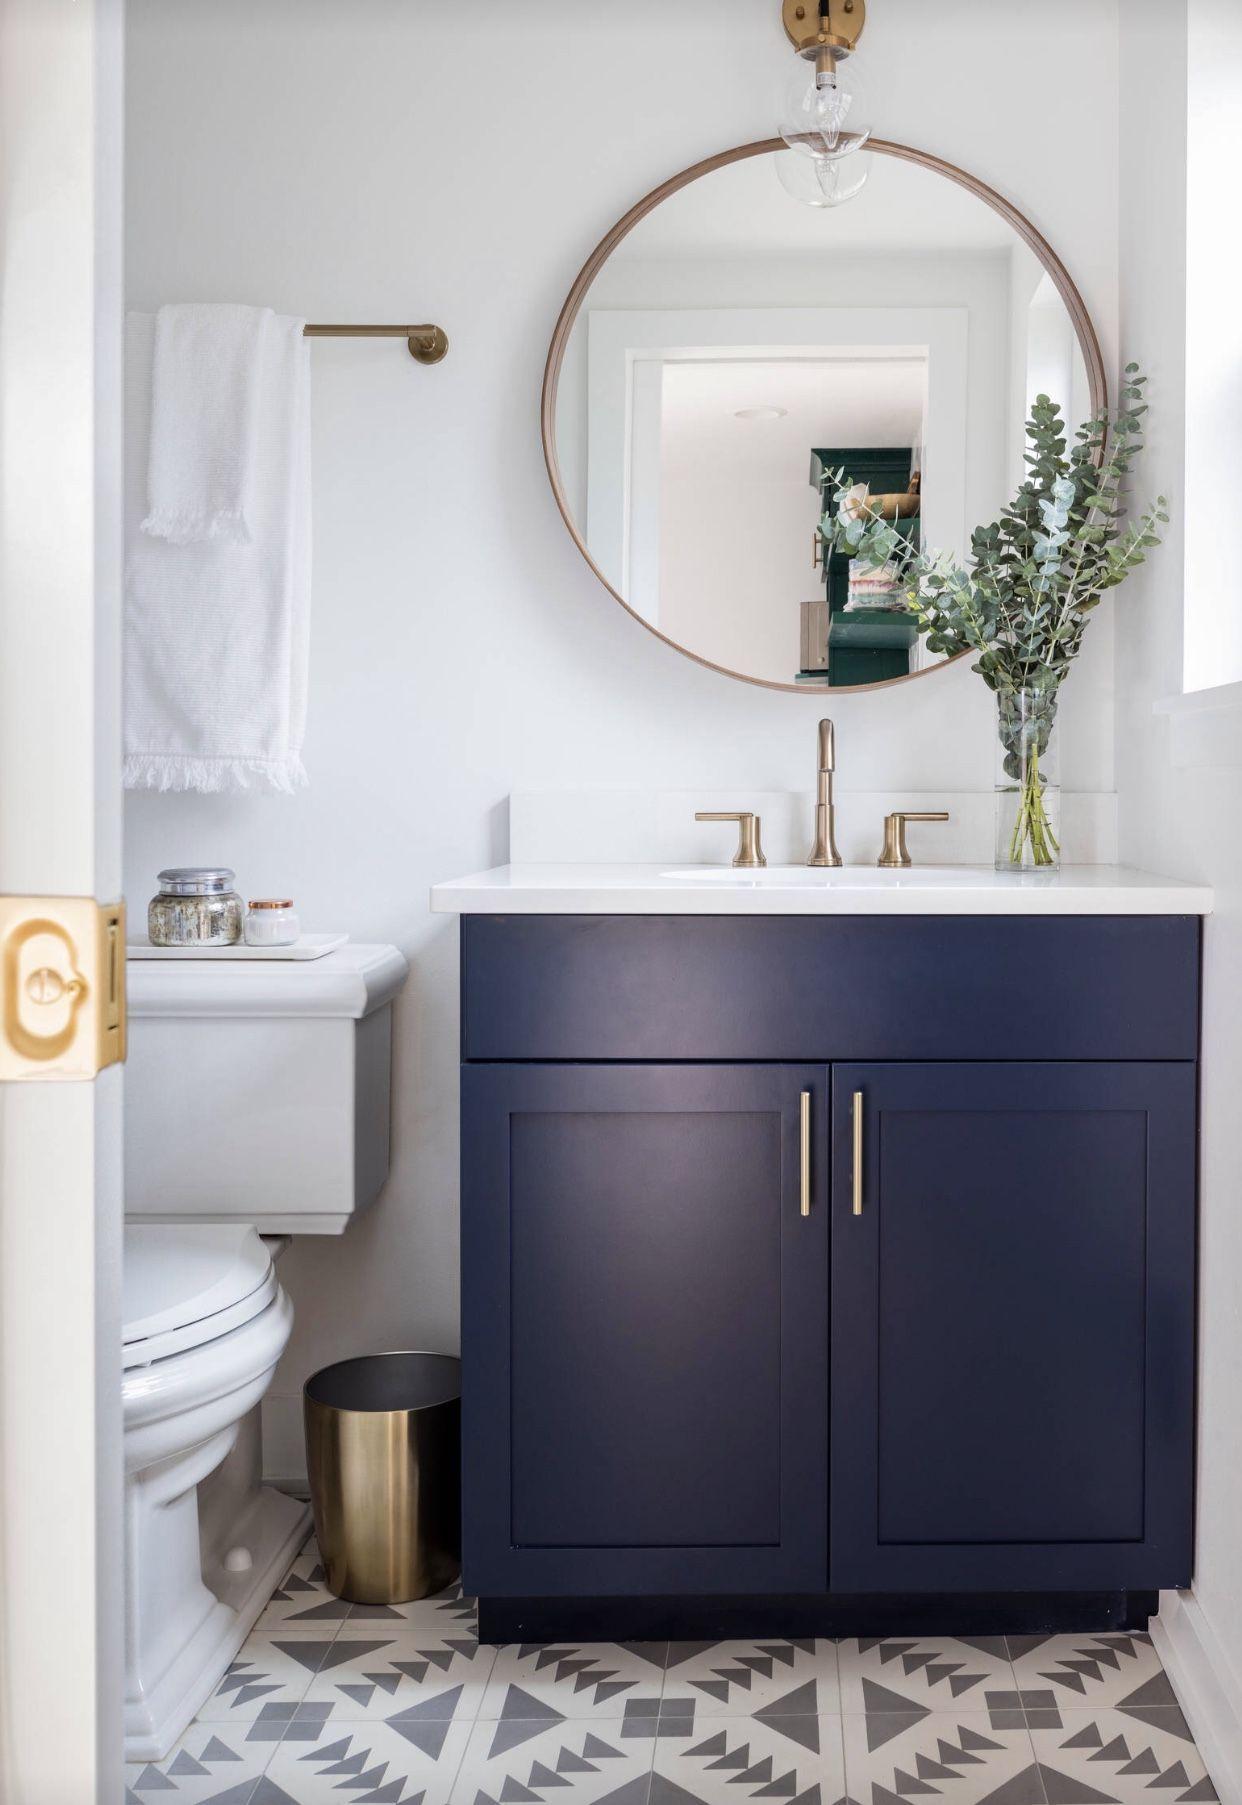 Small Bathroom Design Ideas Small Bathroom Vanities Bathroom Design Small Small Bathroom Design Small bathroom vanity ideas